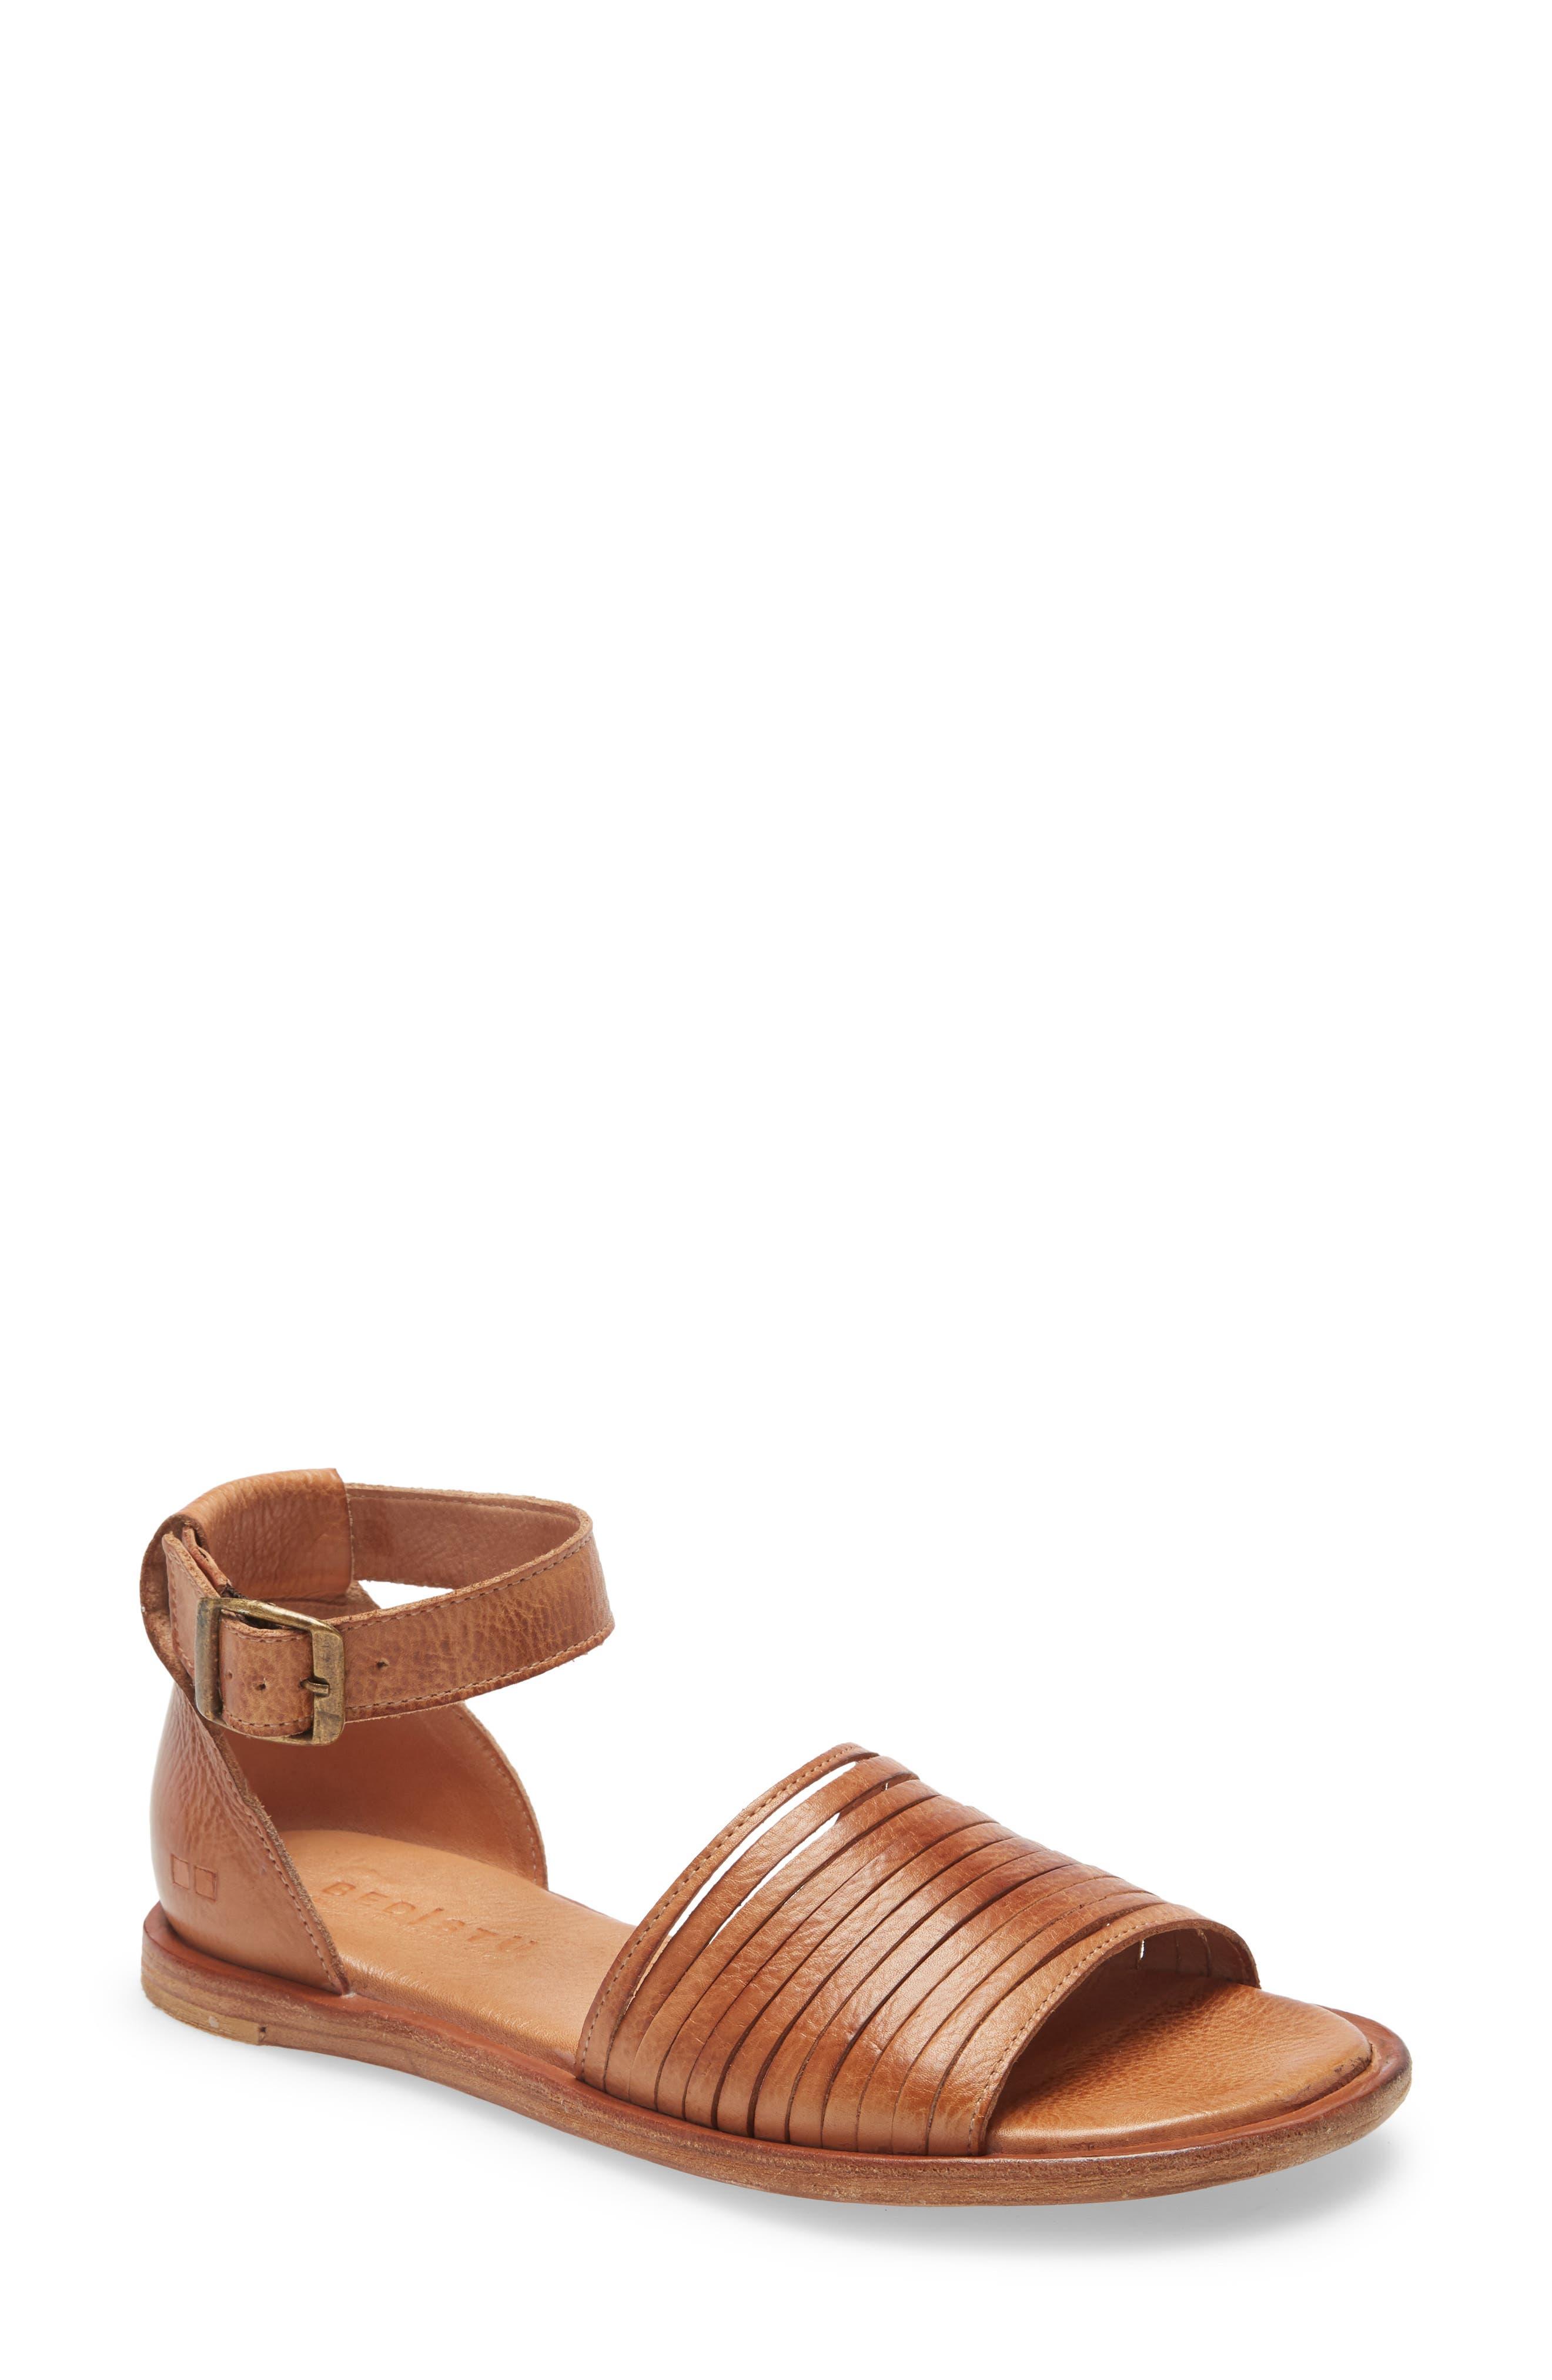 Lilia Ankle Strap Sandal